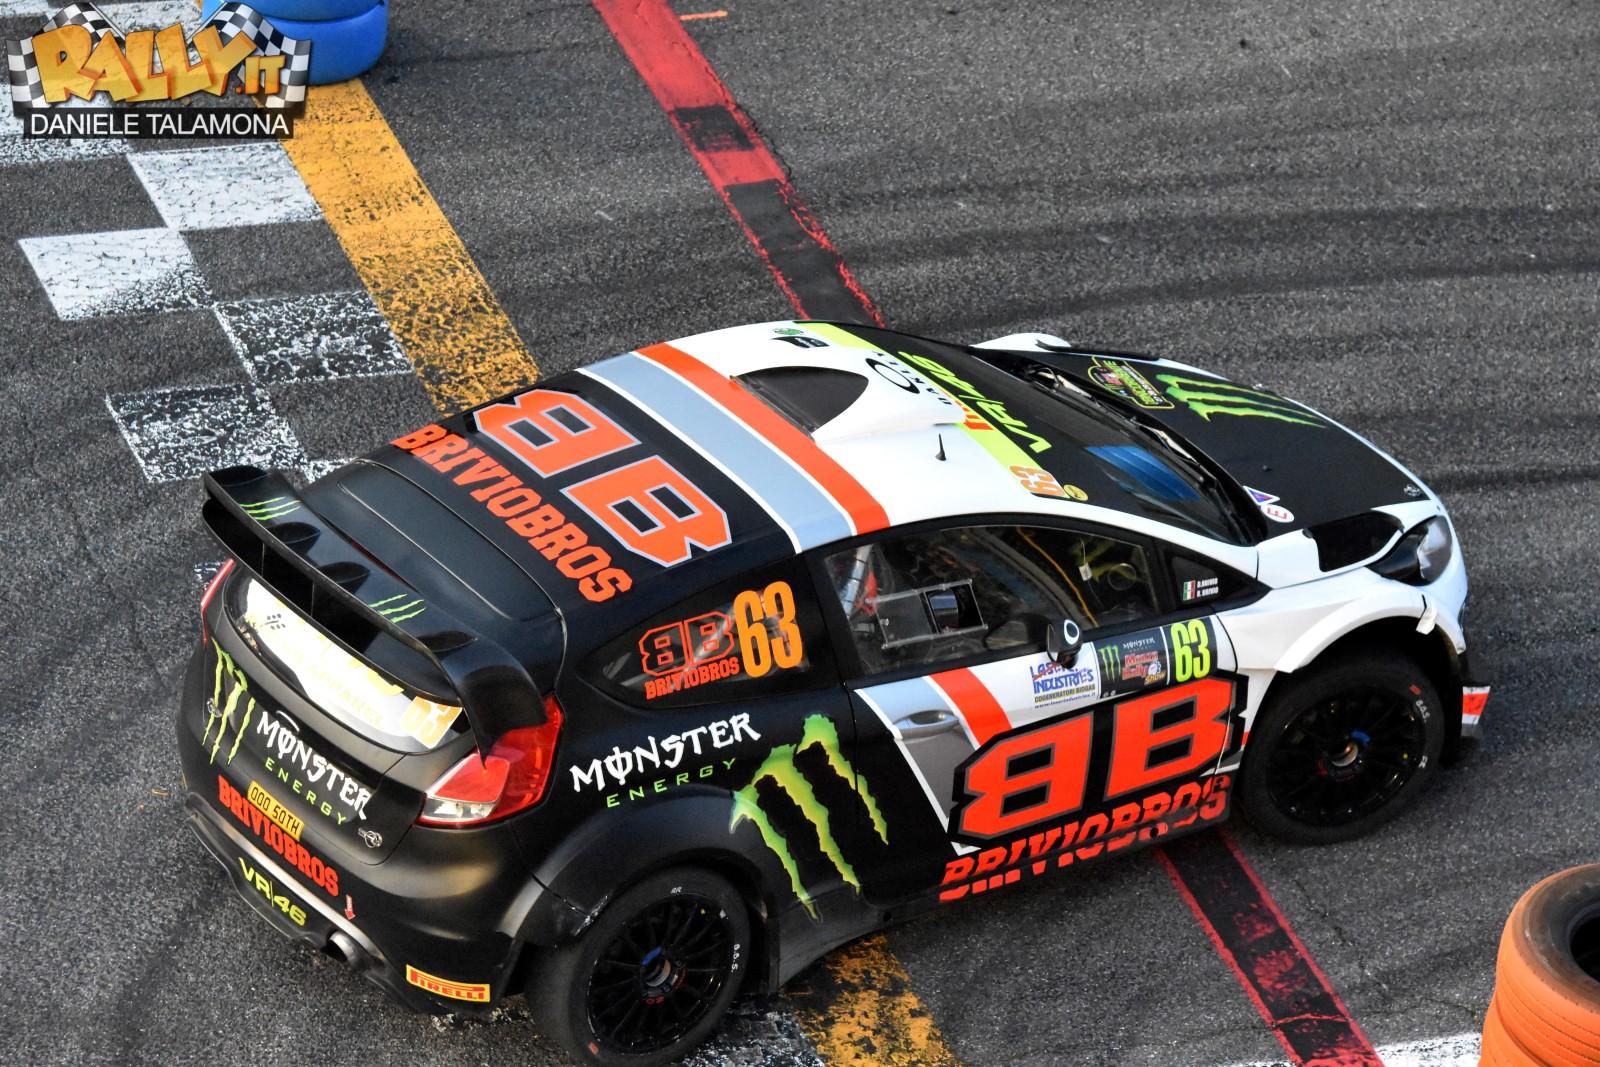 Tanti i piloti presenti al Monster Energy Monza Rally Show